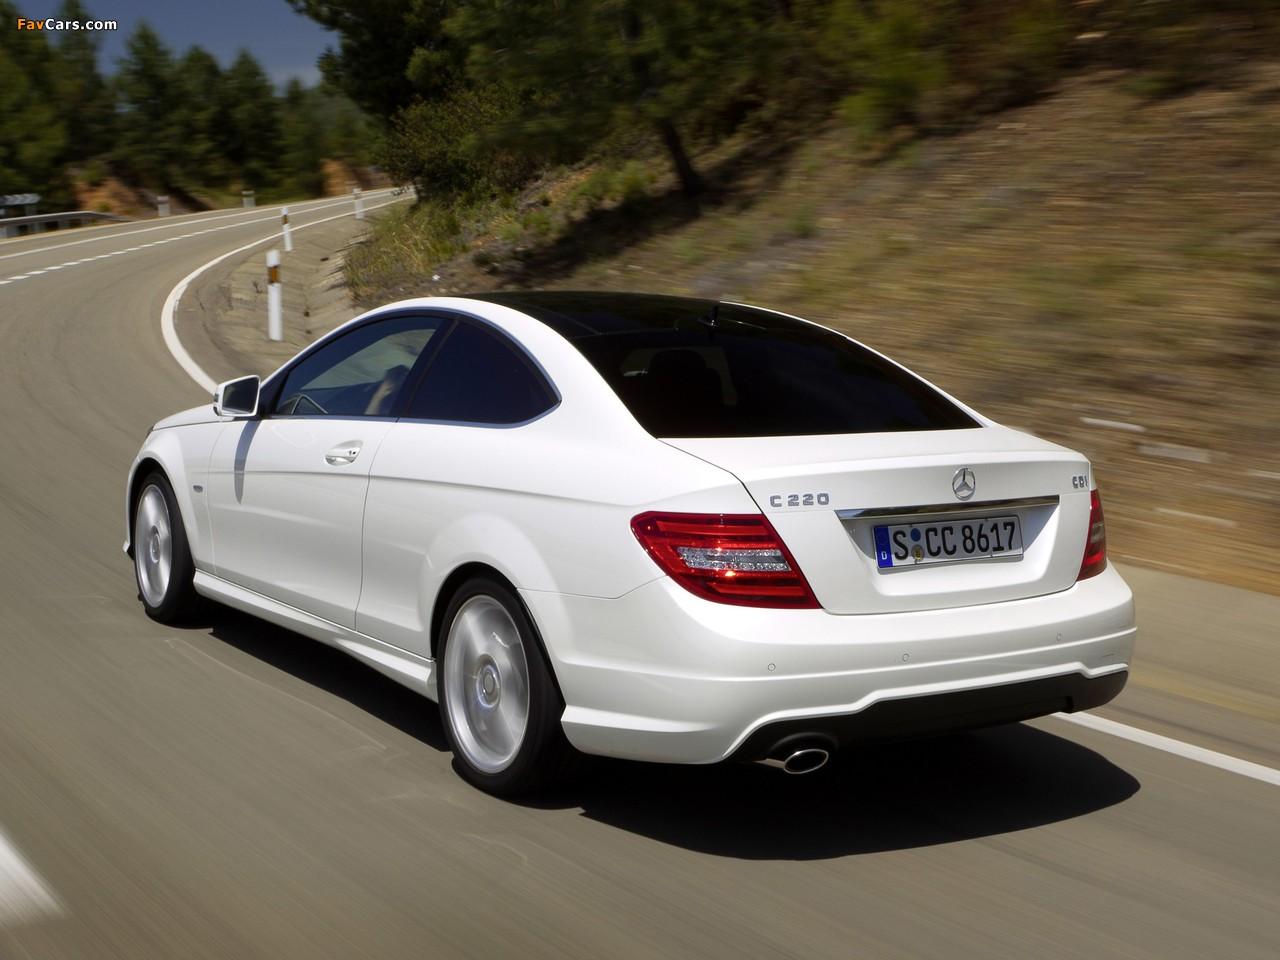 Mercedes-Benz C 220 CDI Coupe (C204) 2011 images (1280 x 960)